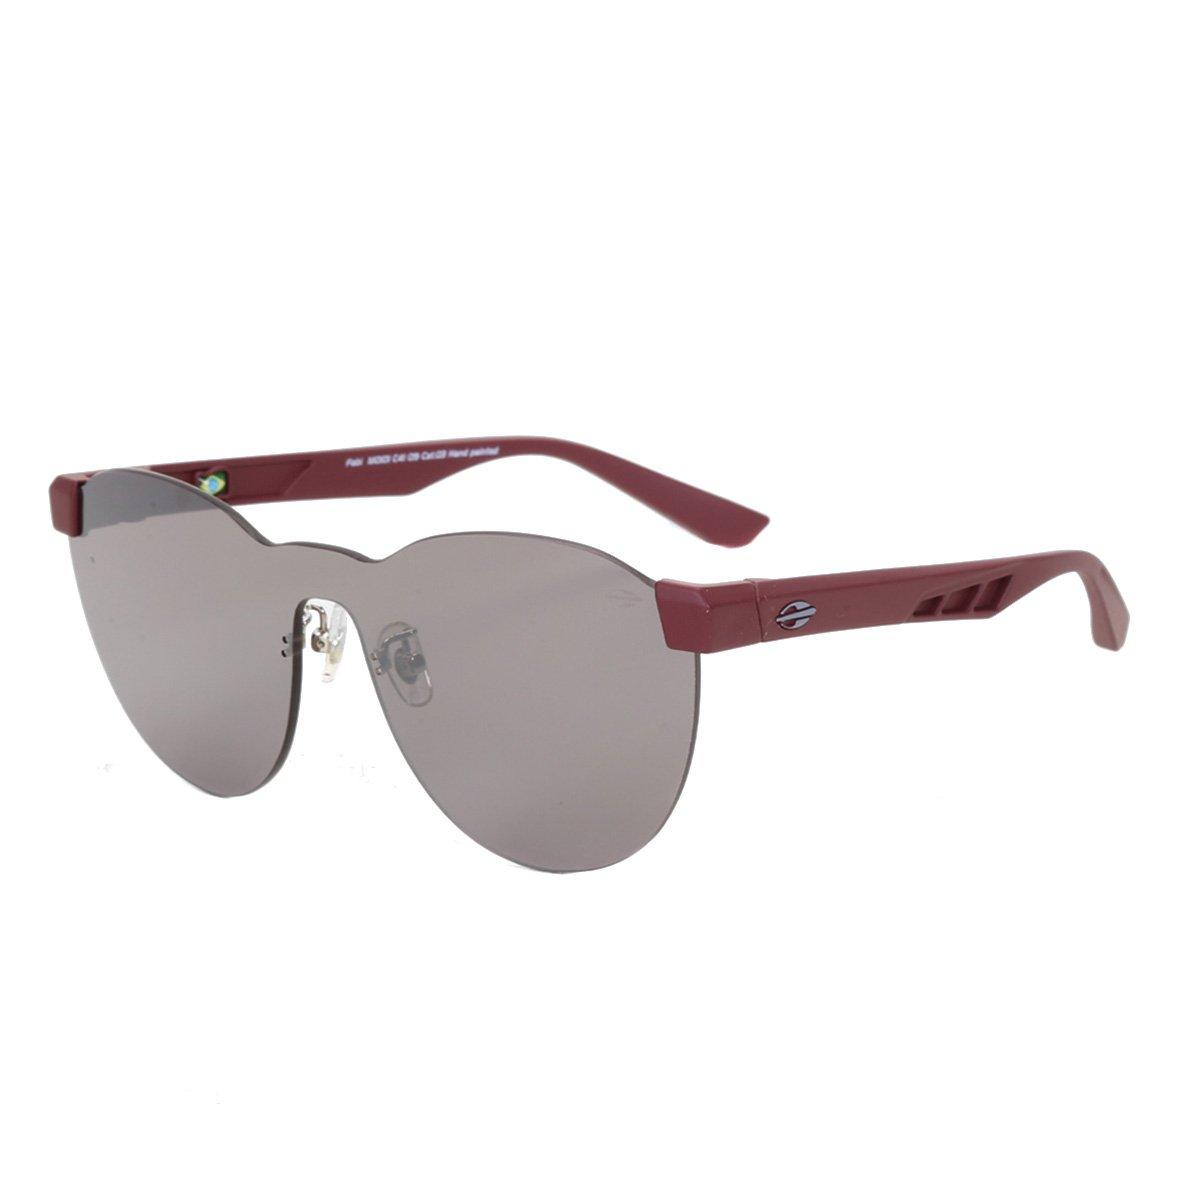 Óculos de Sol Mormaii Fabi M0101C4109 Feminino